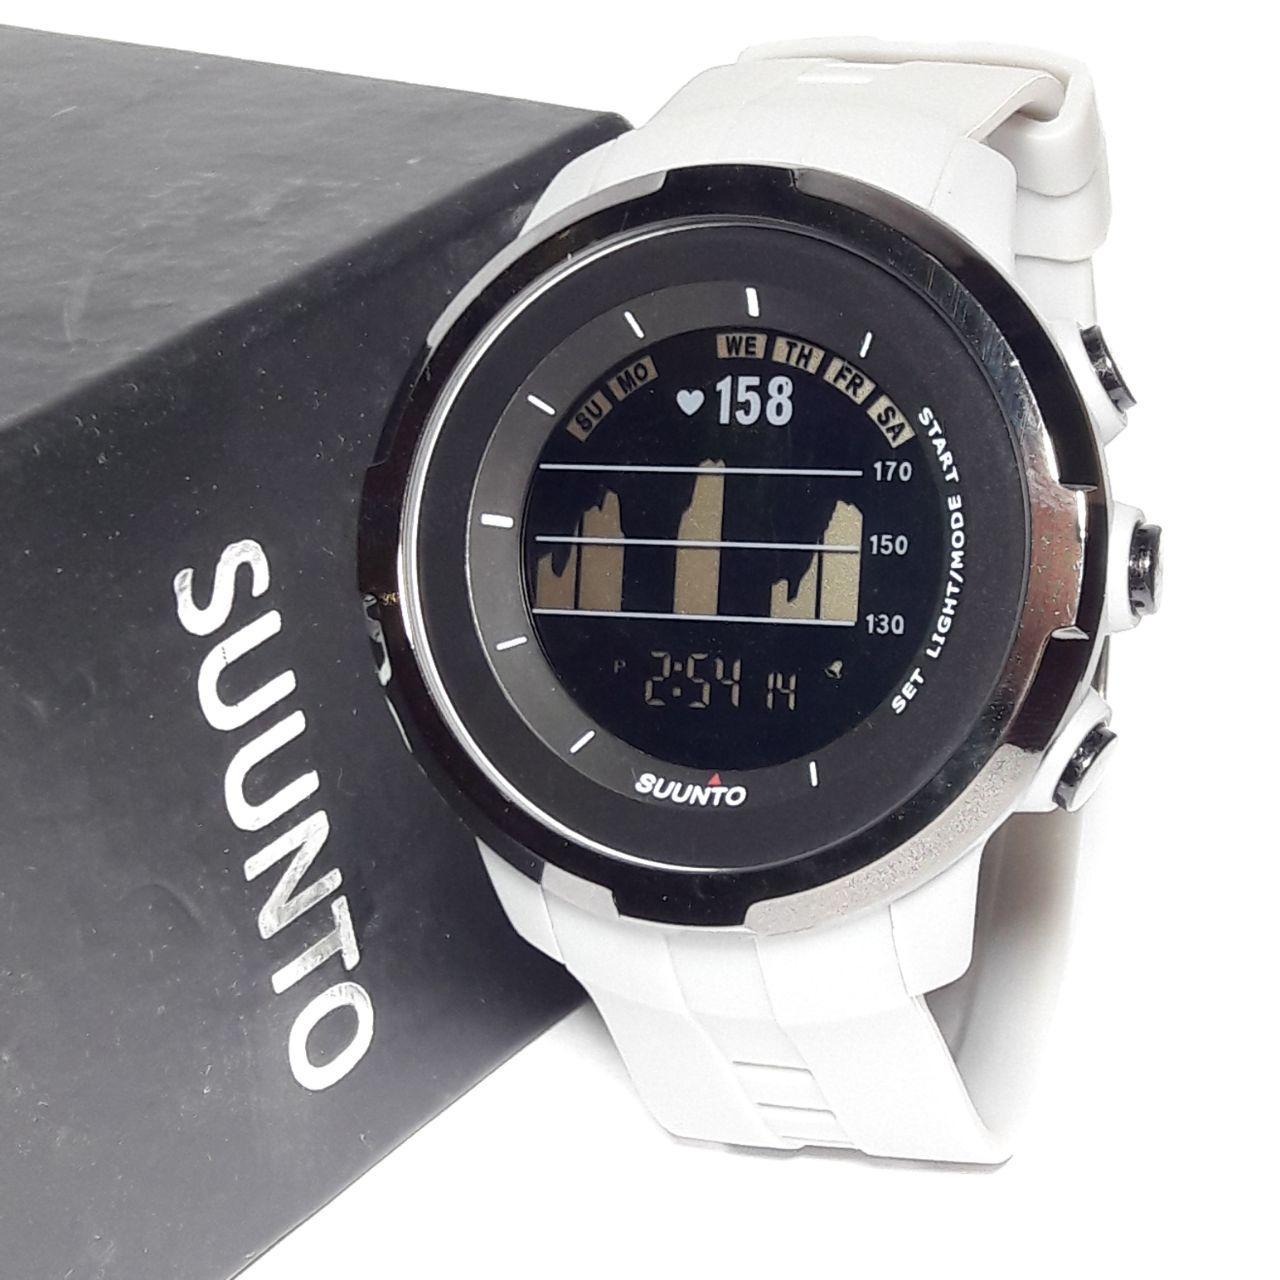 Jam tangan Pria Sunto suunto Core digital rubber putih